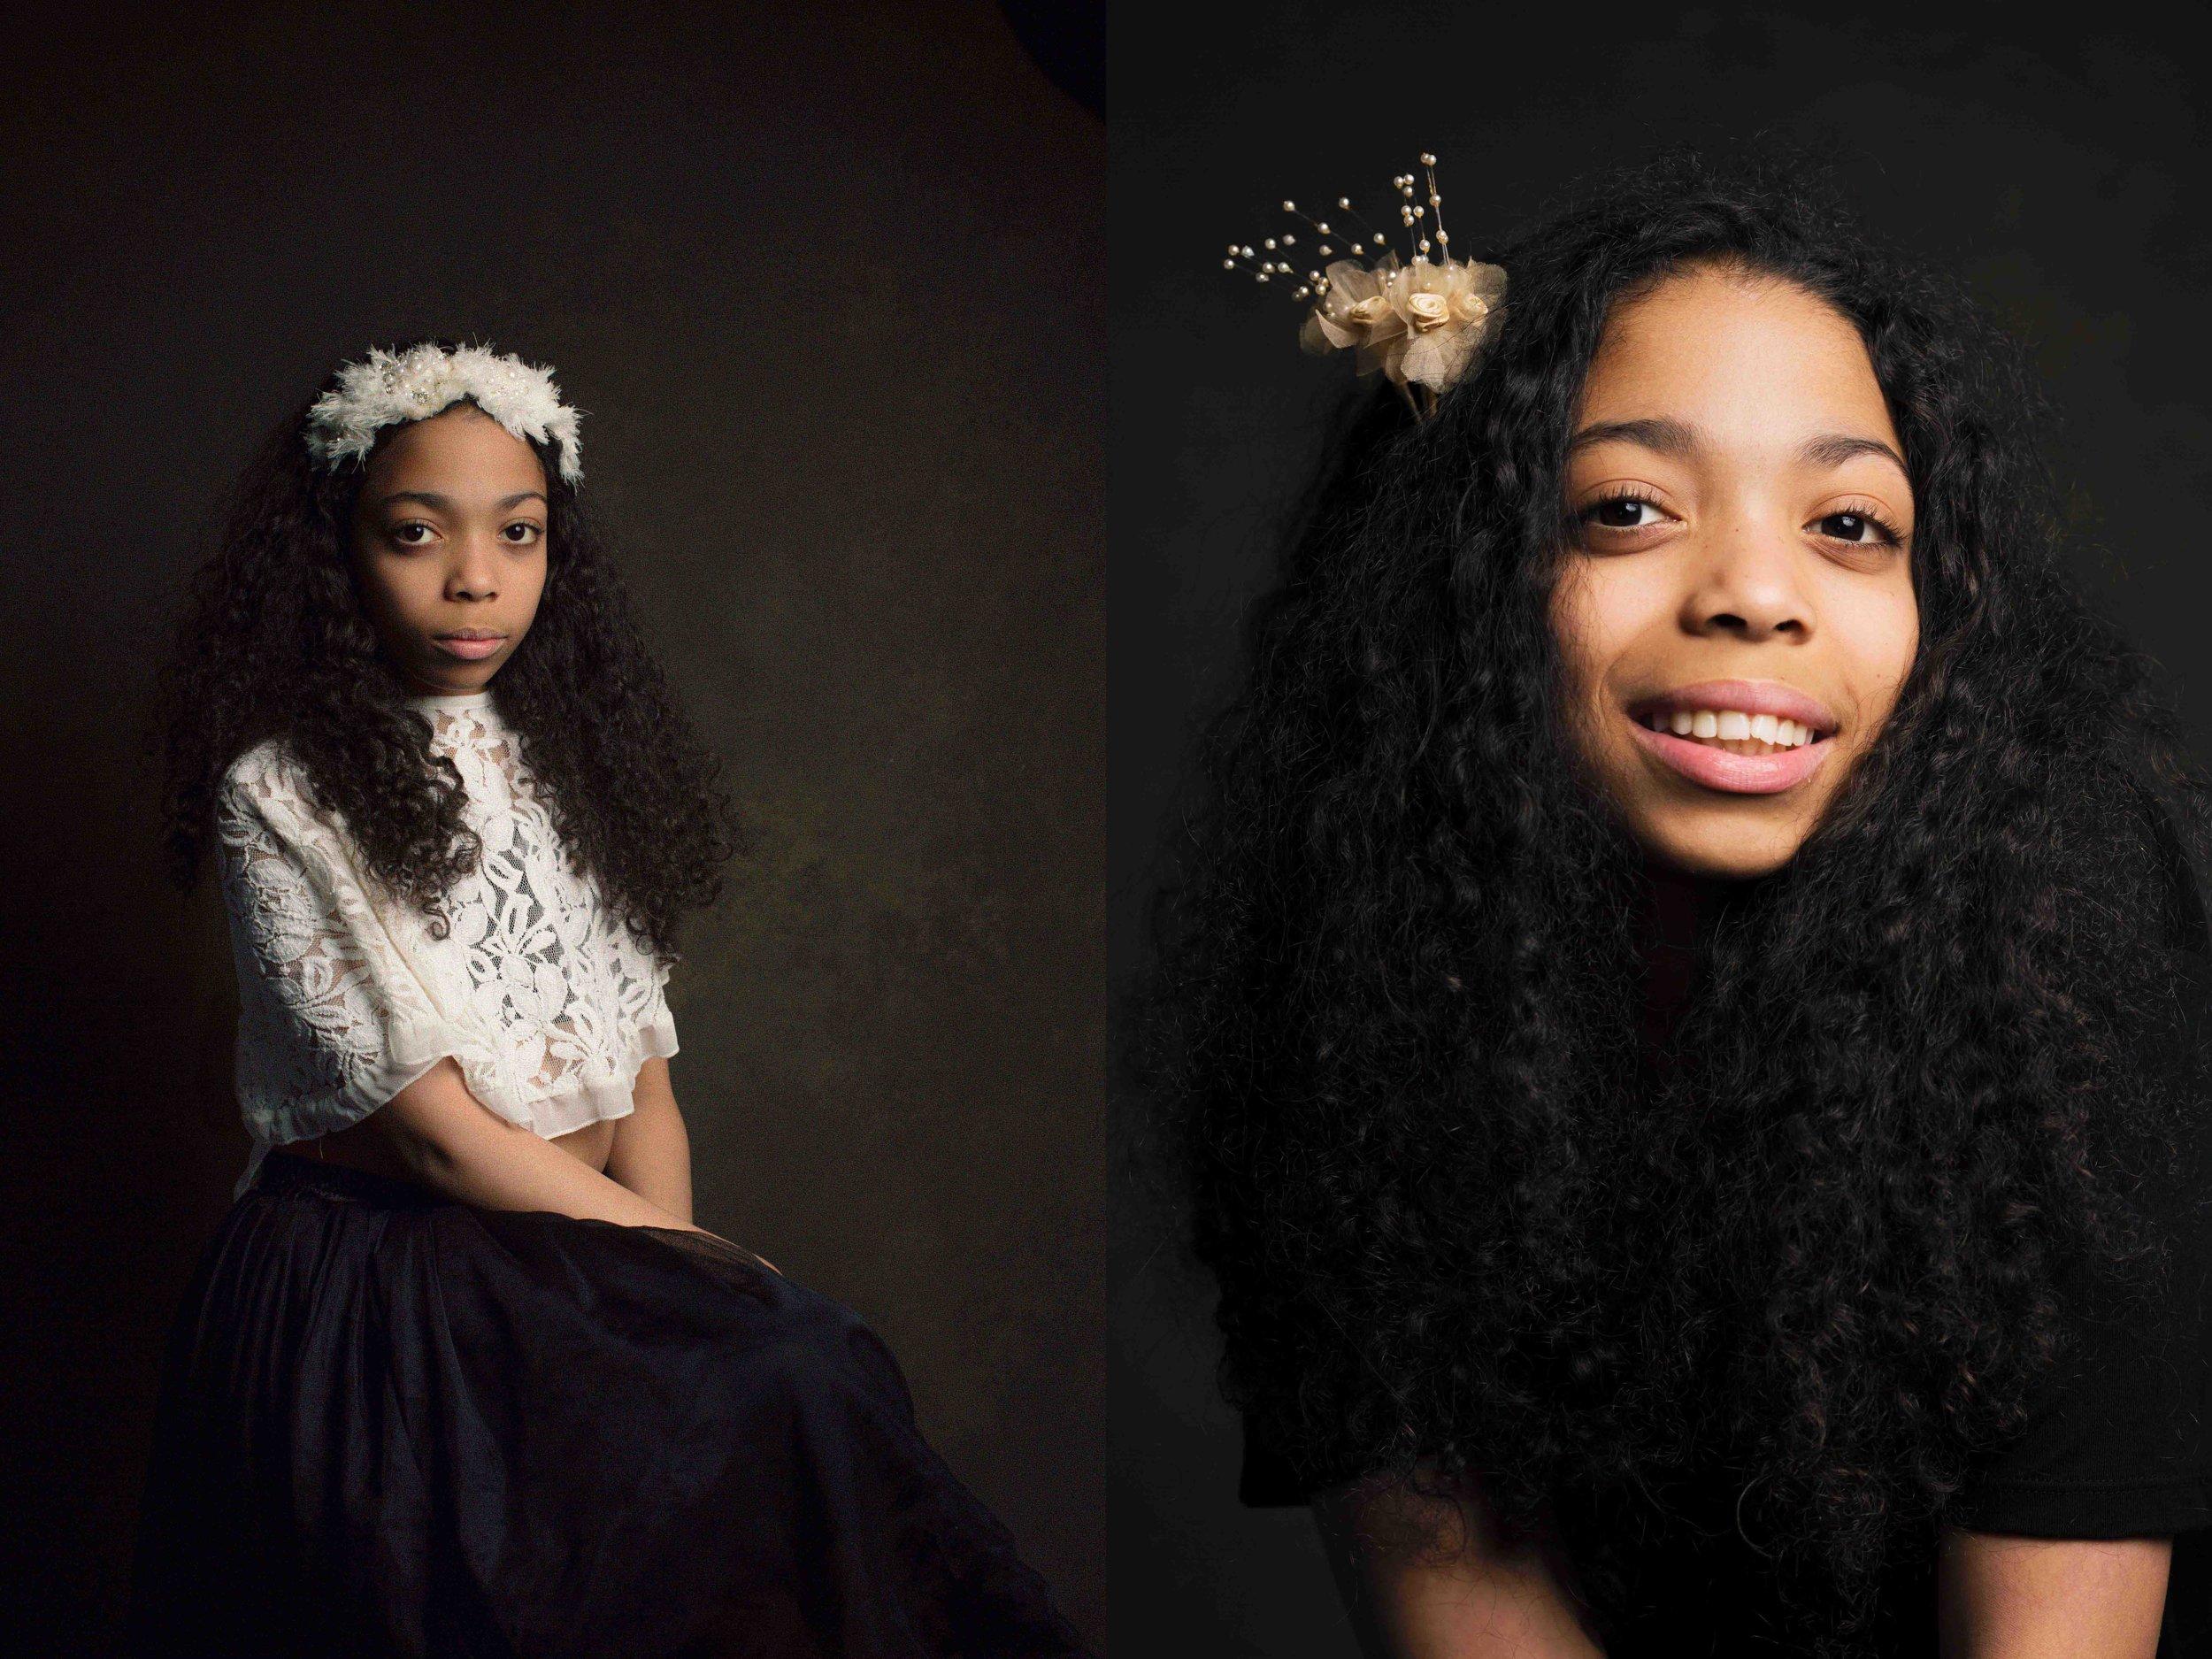 Childrens photographer Studioa.jpg